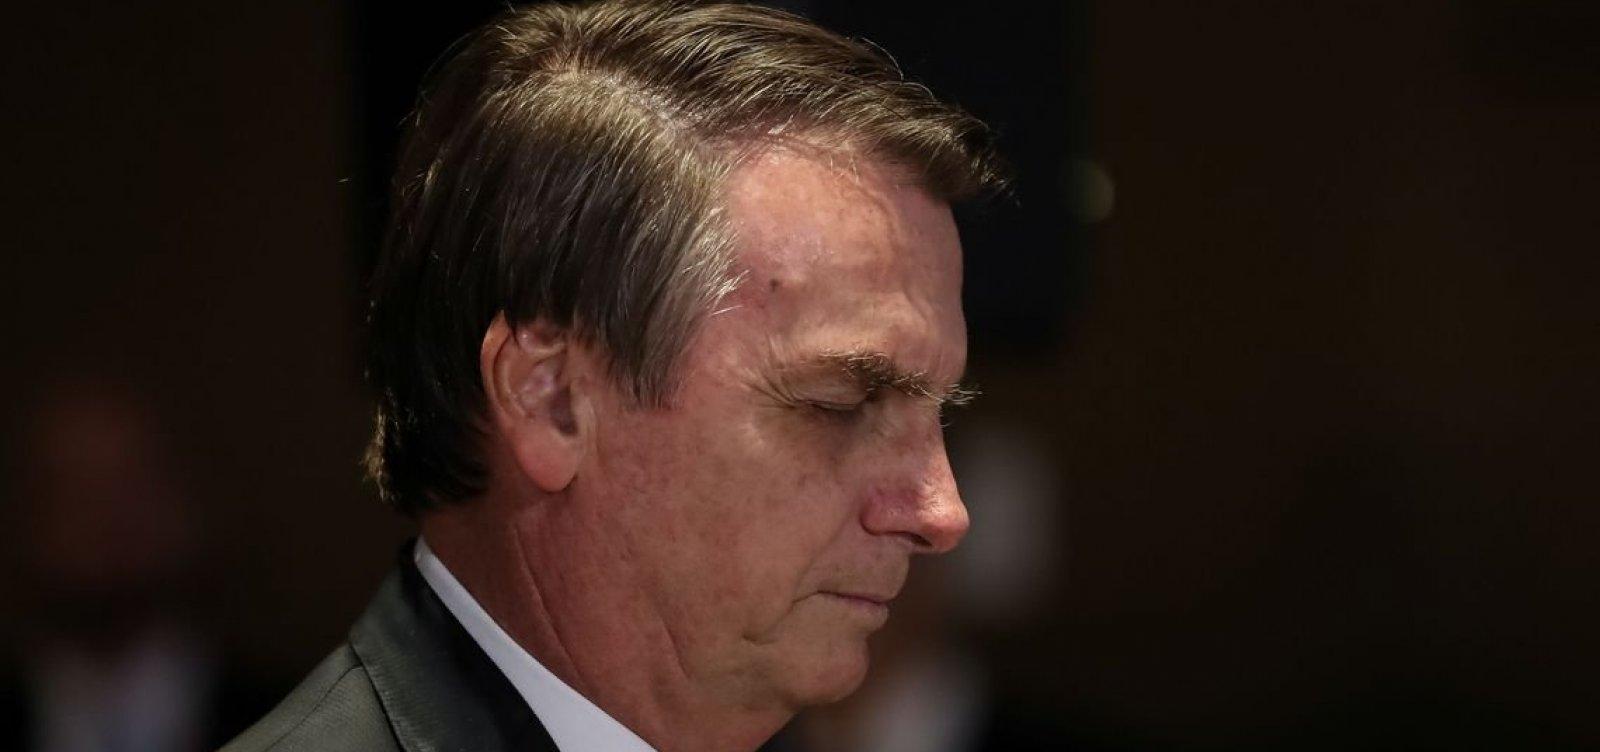 Presidente de Israel critica fala de Bolsonaro sobre Holocausto